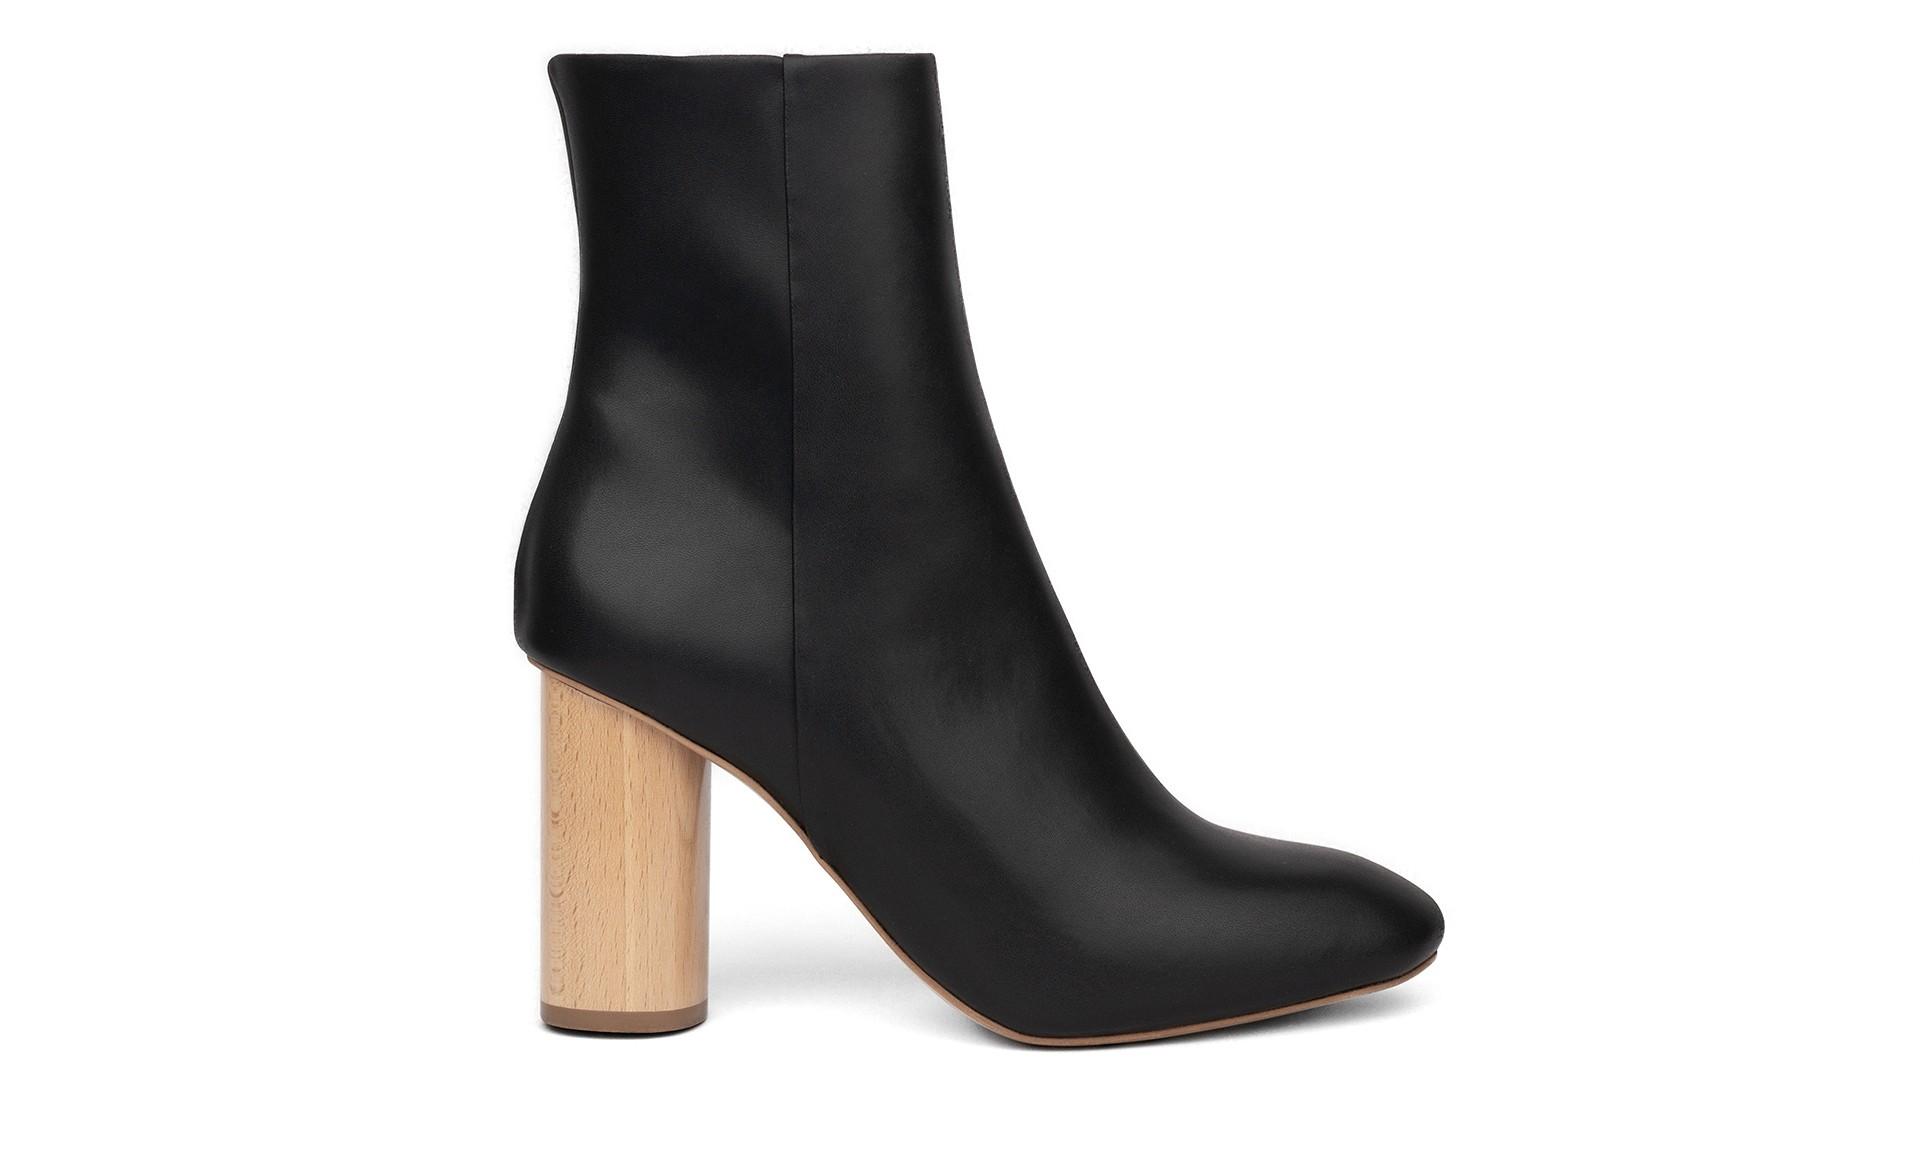 SYDNEY BROWN High Ankle Boot Black